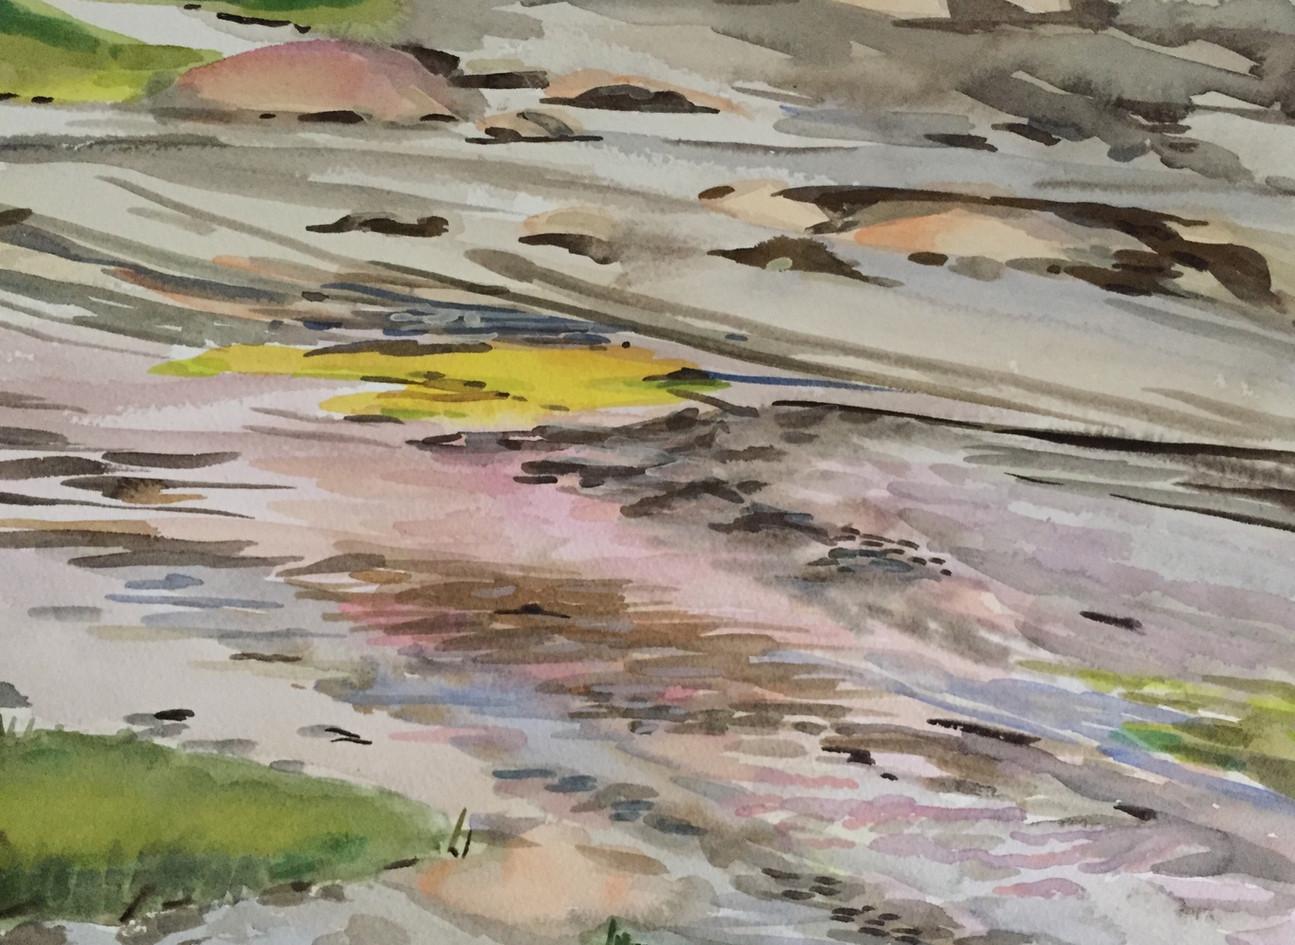 Low Tide, Sprucehead Island